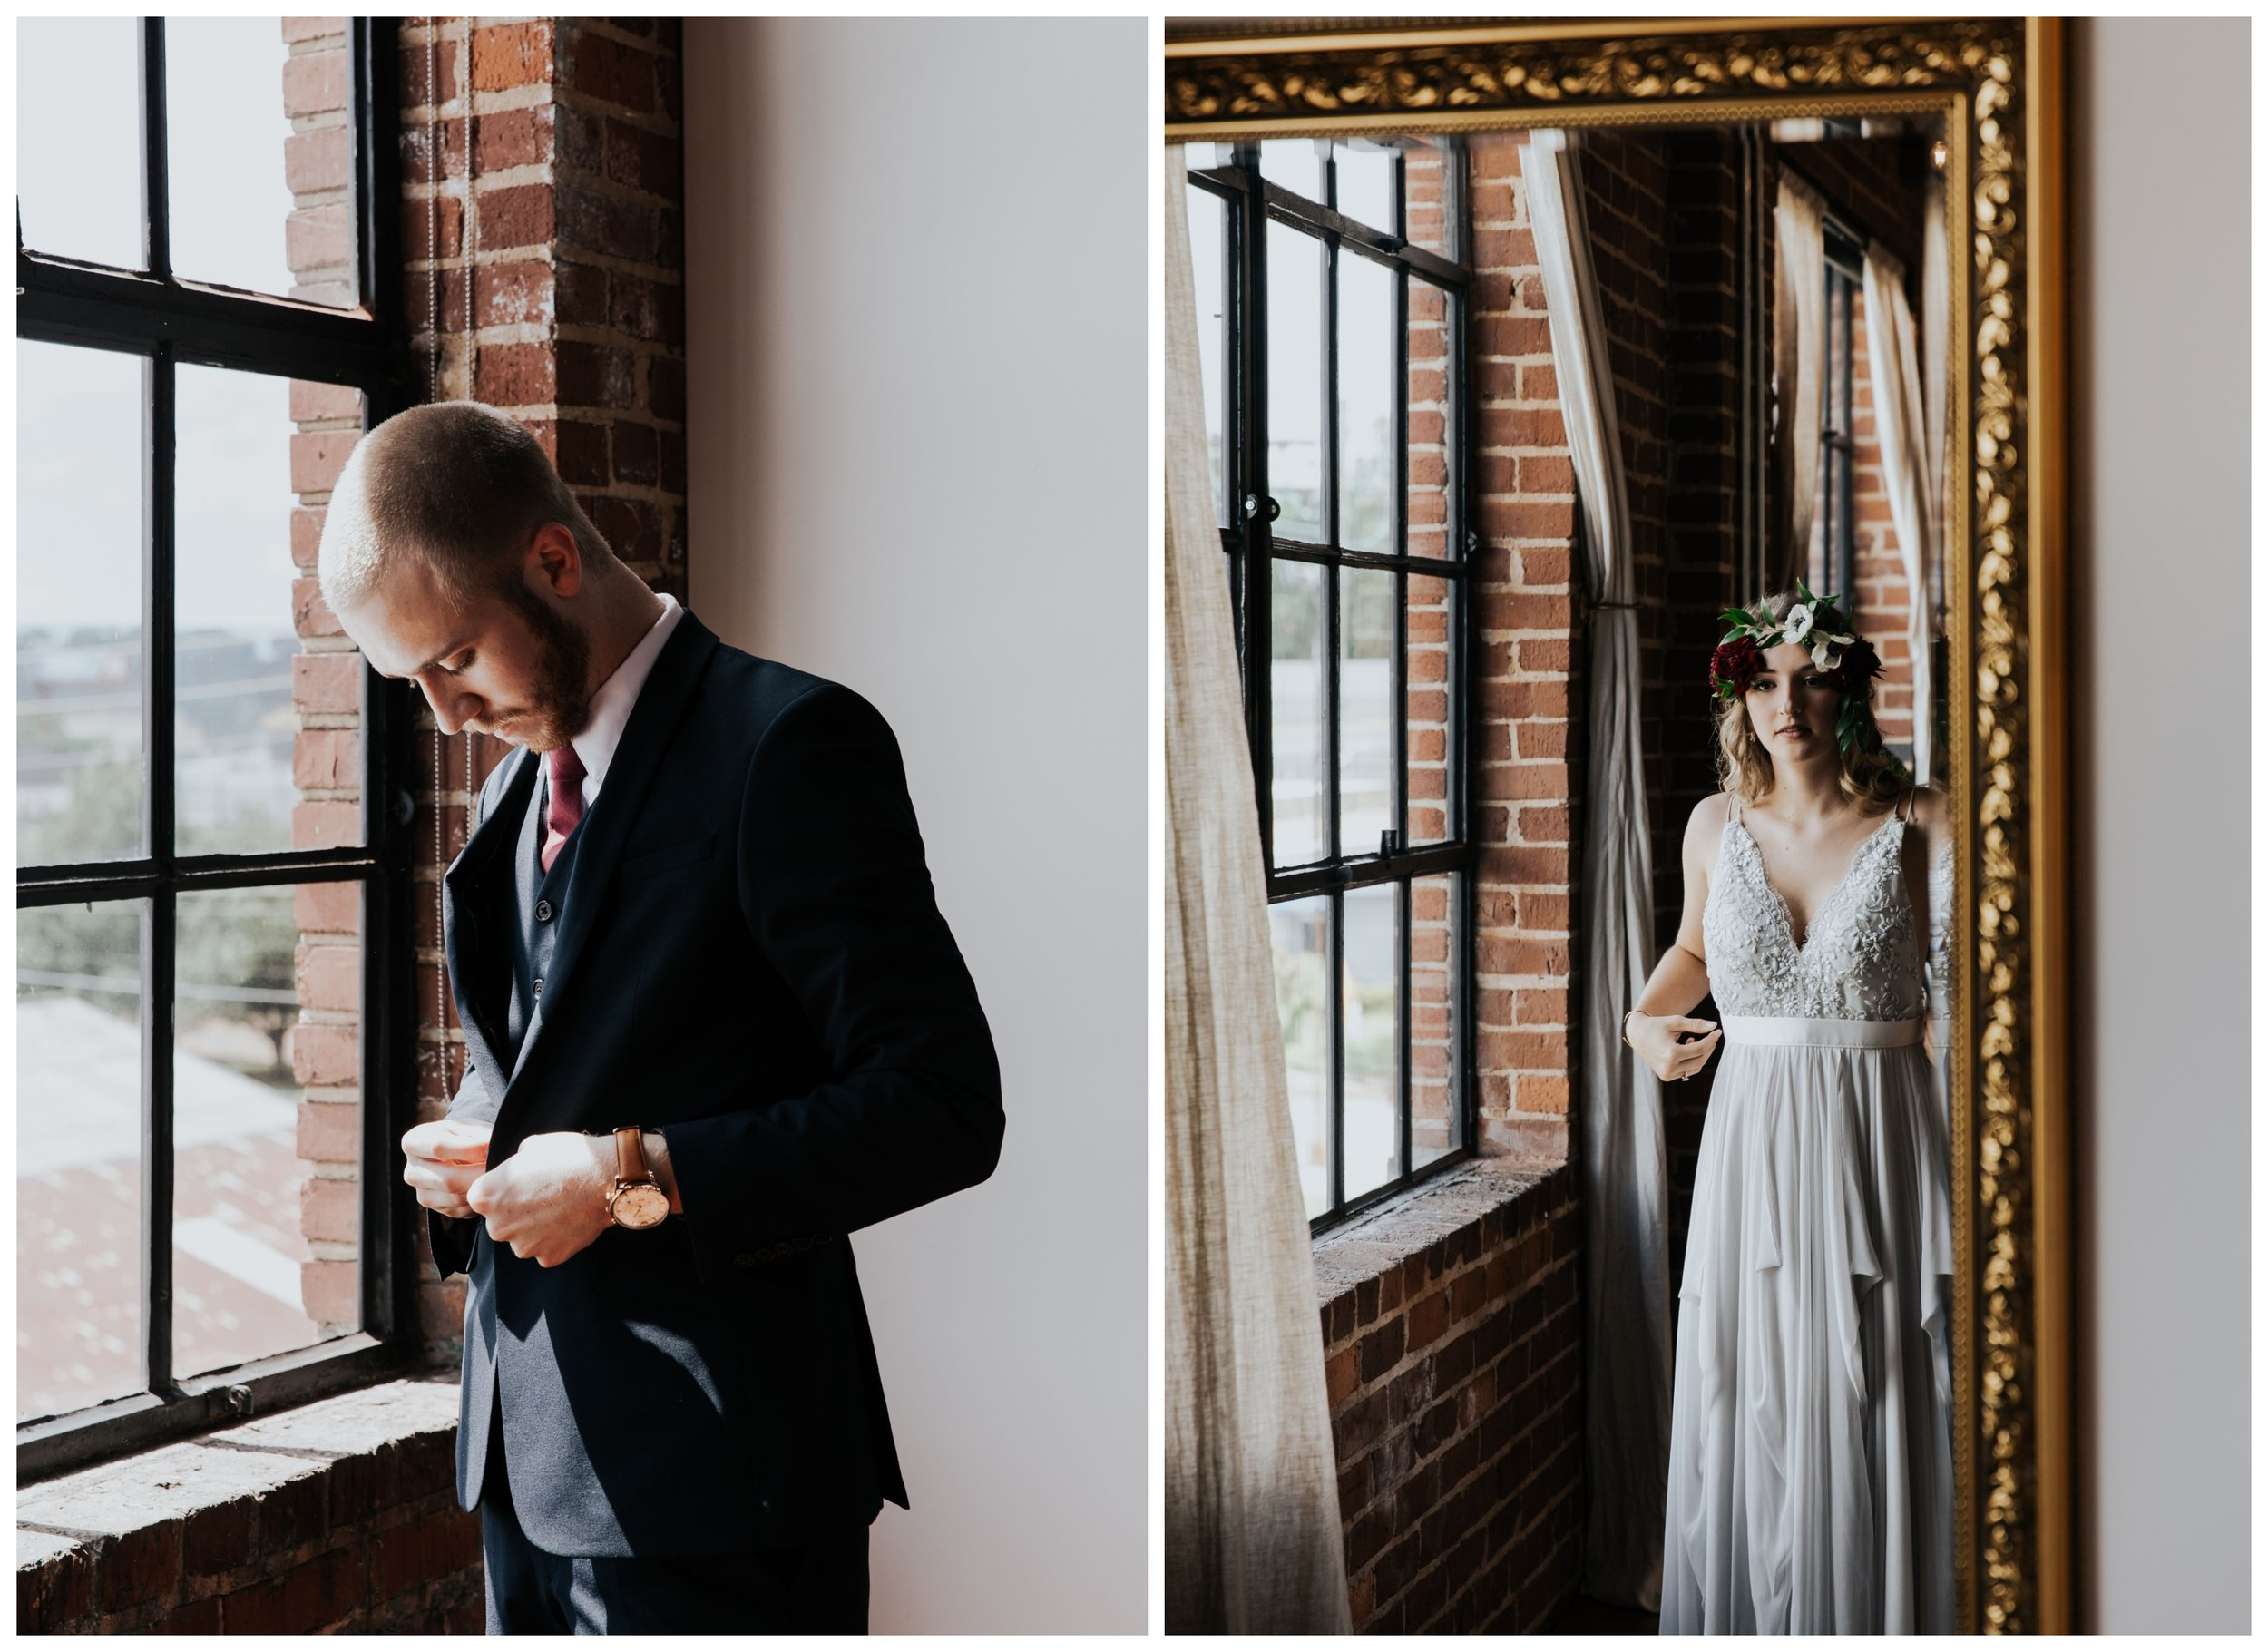 Kiersten & Matt's Urban Bohemian Wedding at The Turnbull